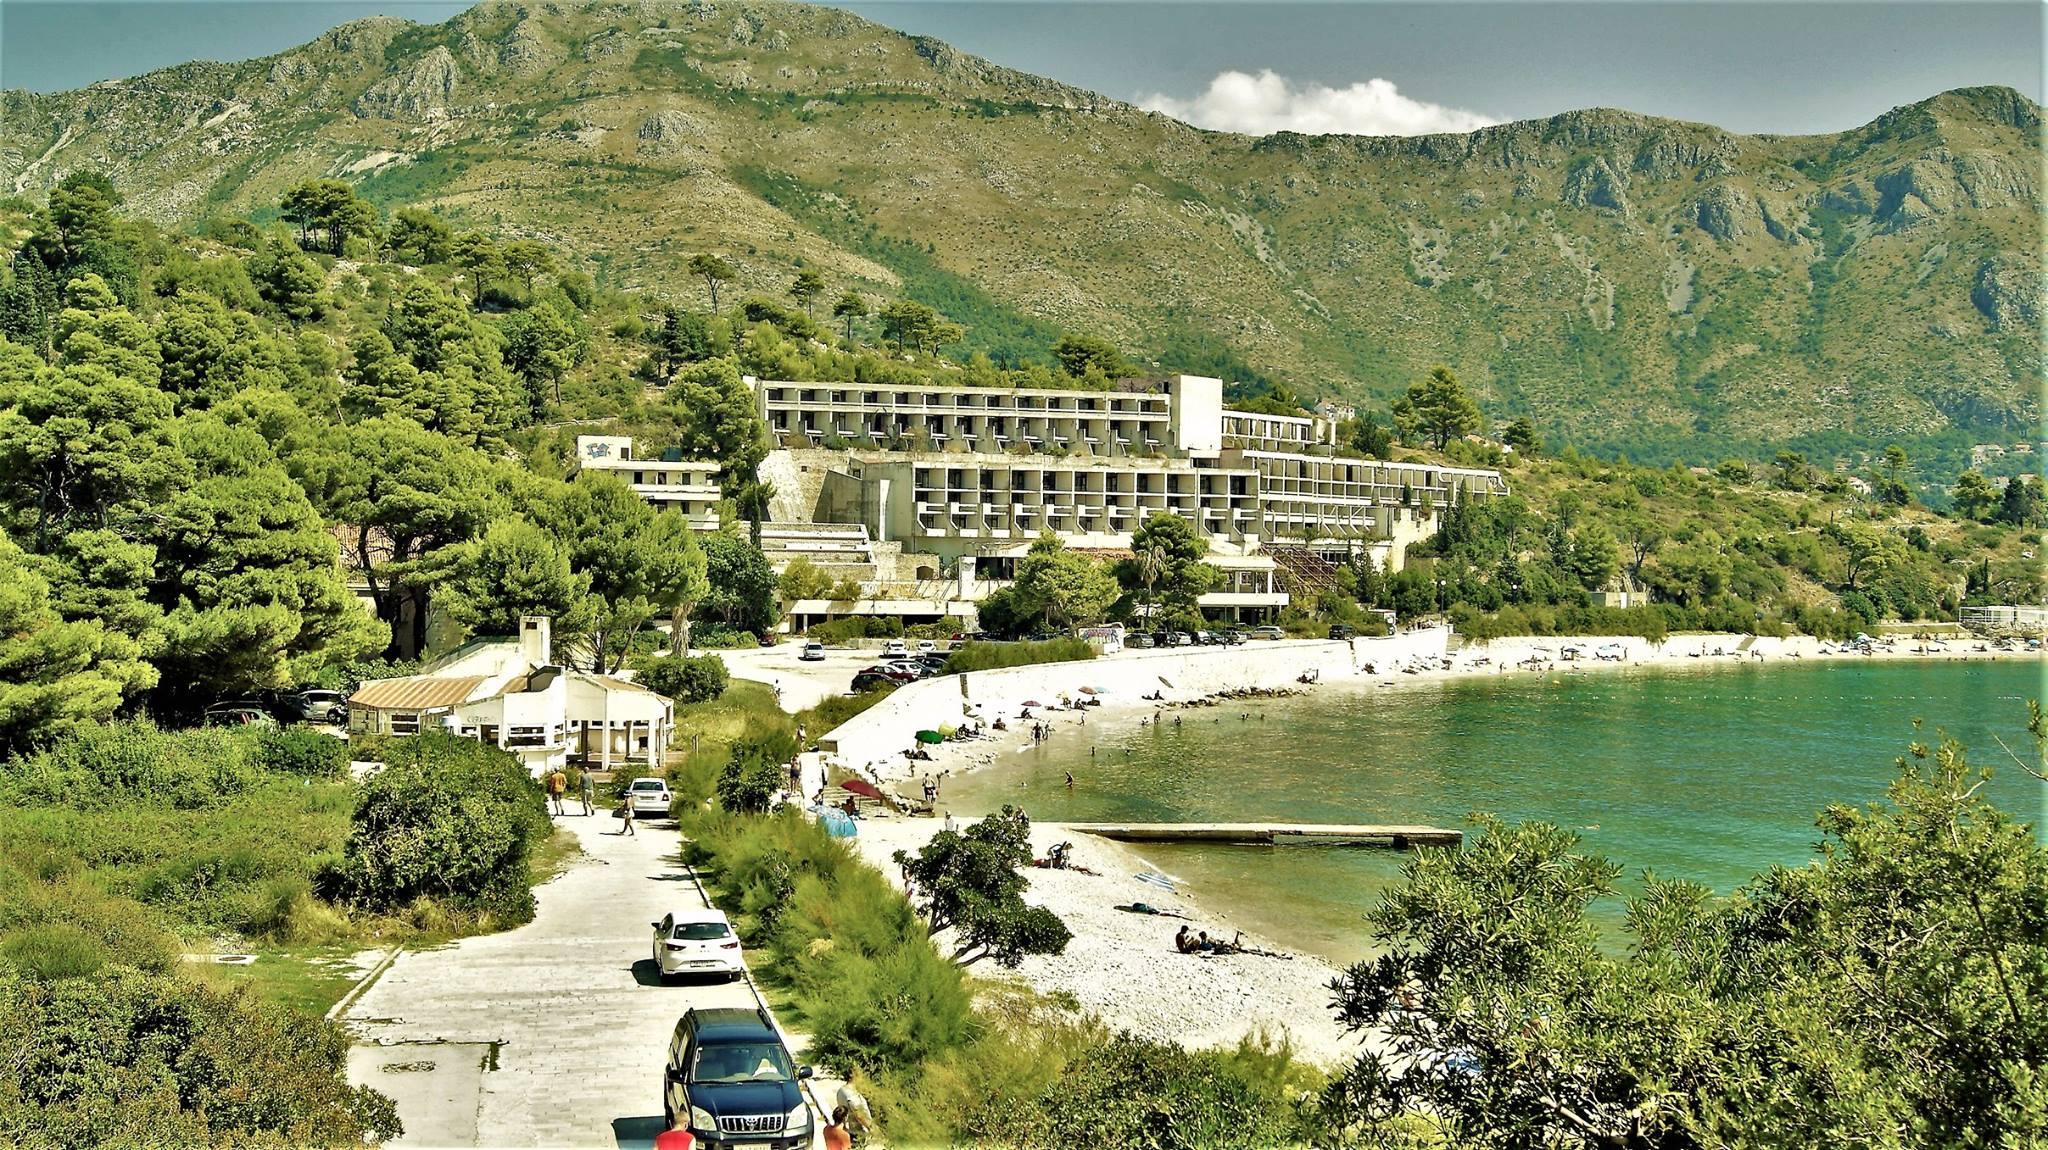 Kupari - zatoka umarłych hoteli